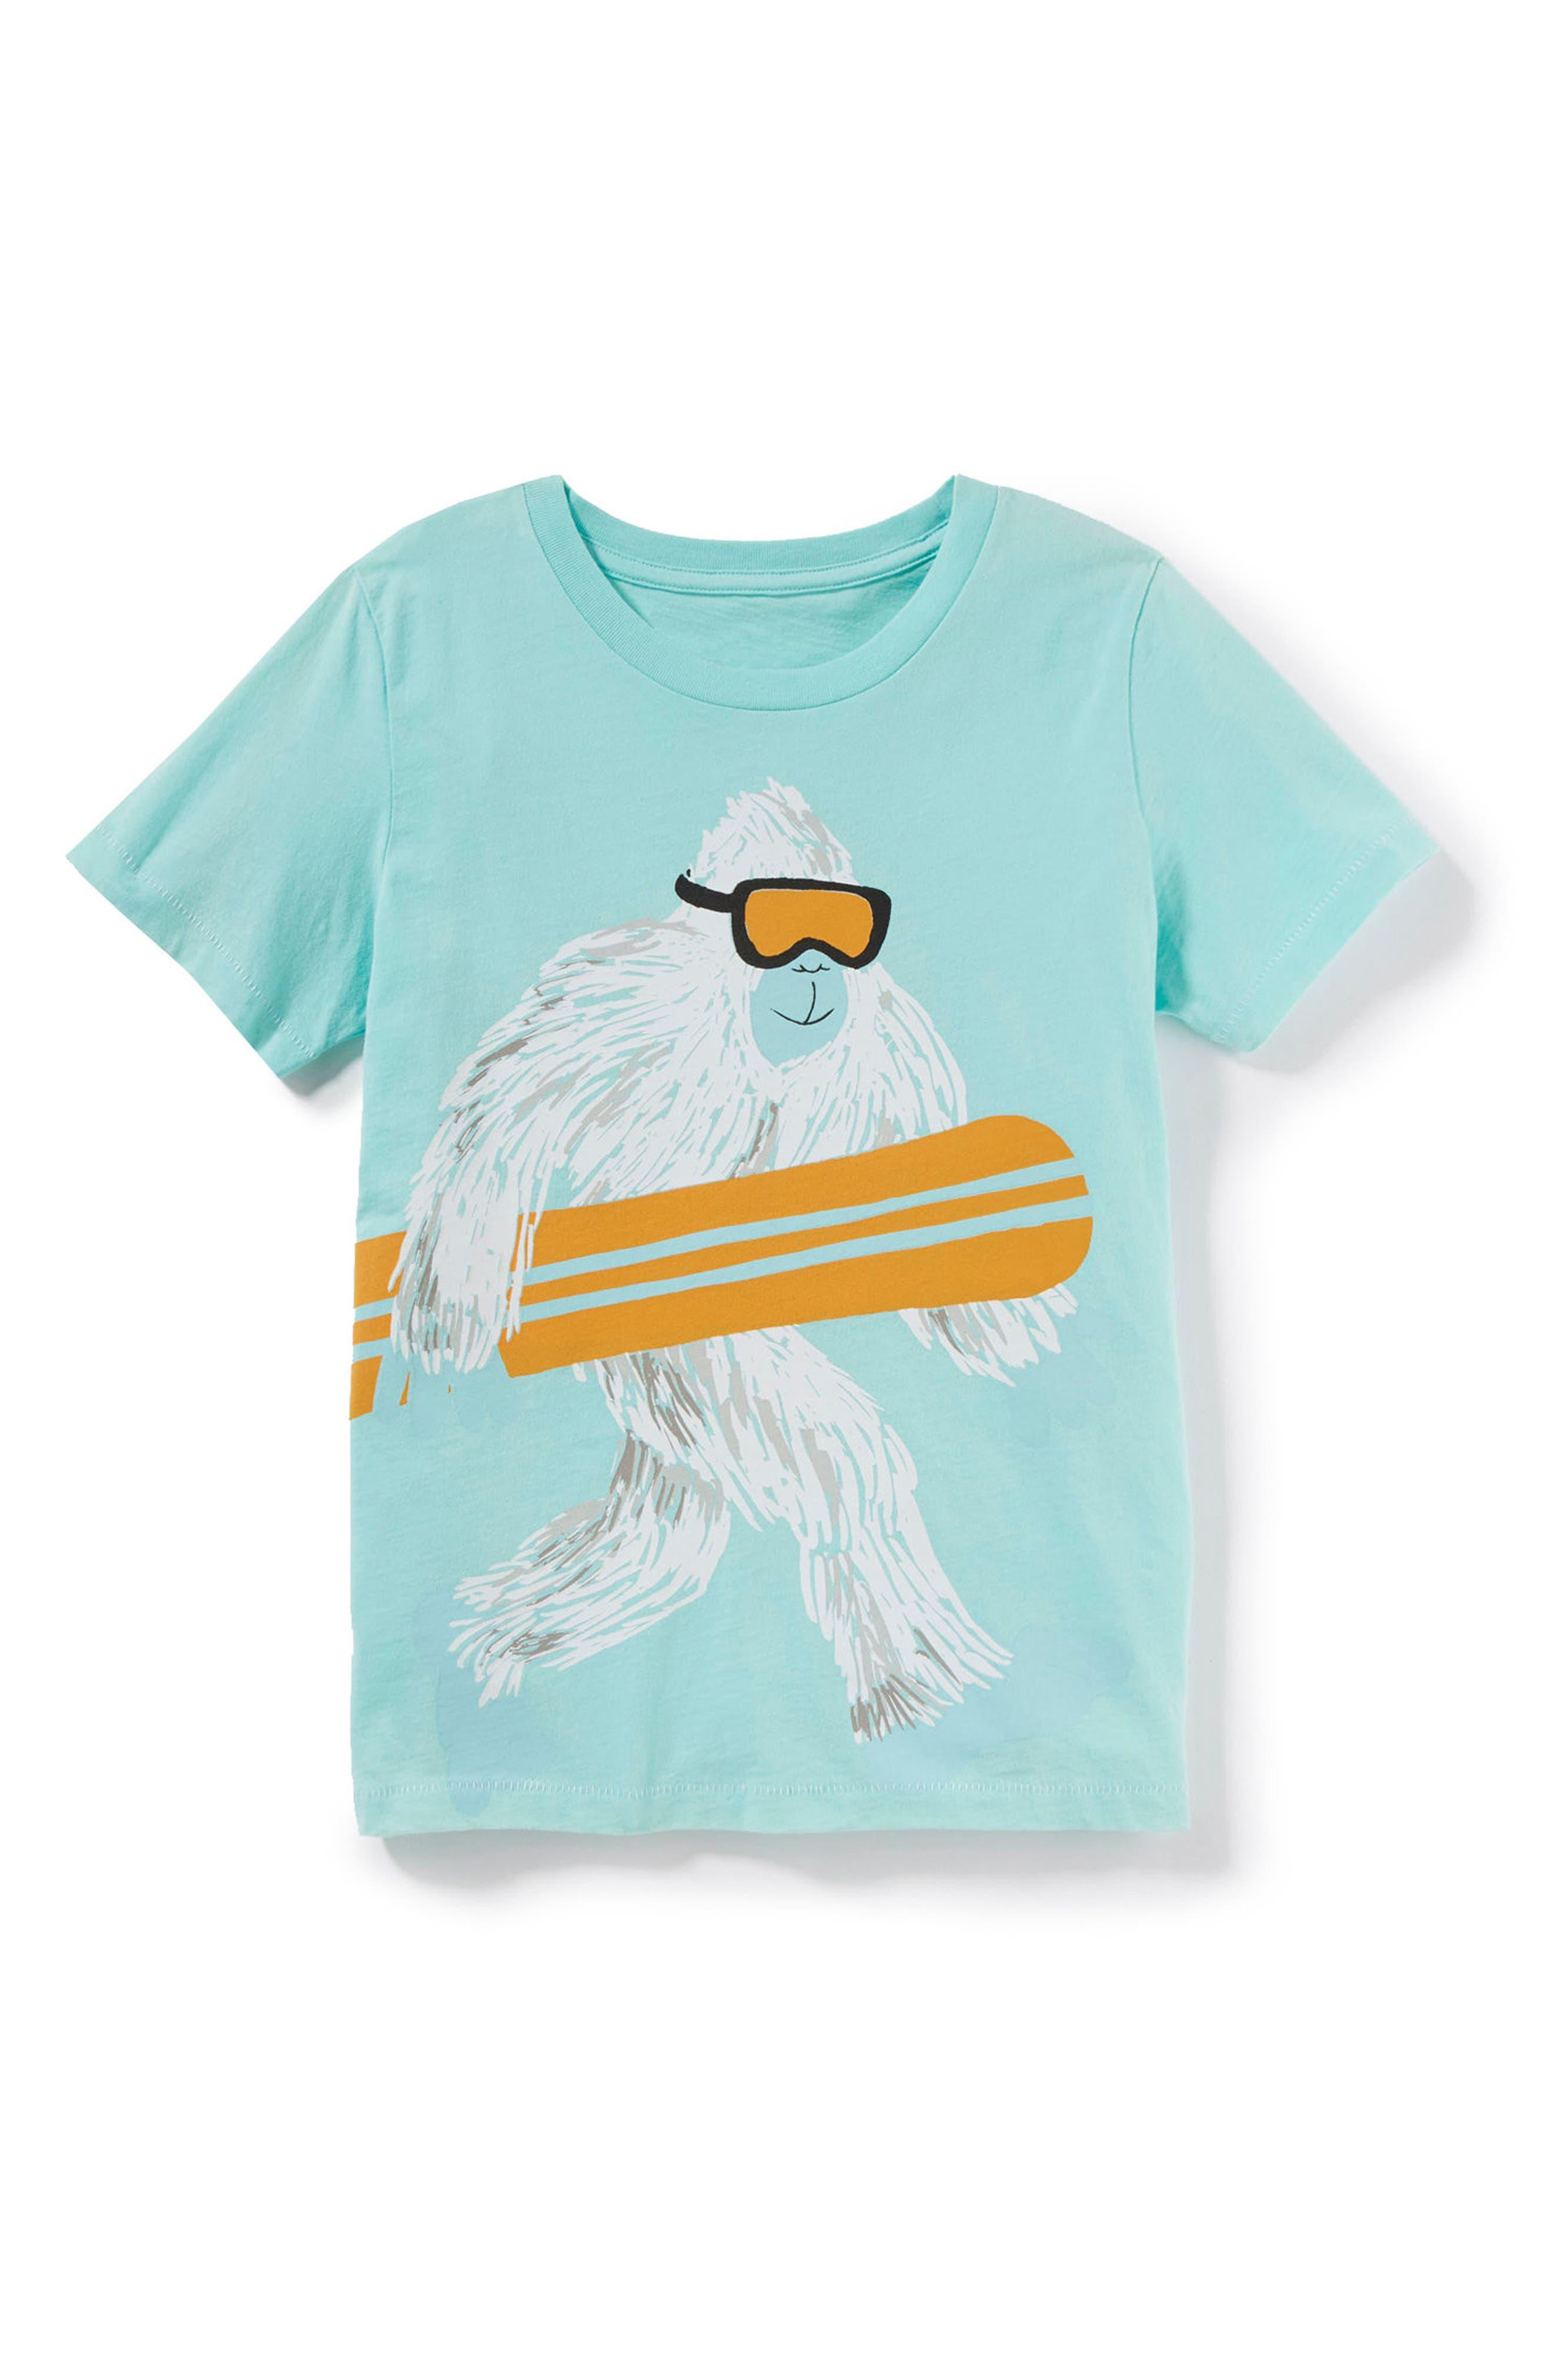 Main Image - Peek Yeti Snowboard Graphic T-Shirt (Toddler Boys, Little Boys & Big Boys)